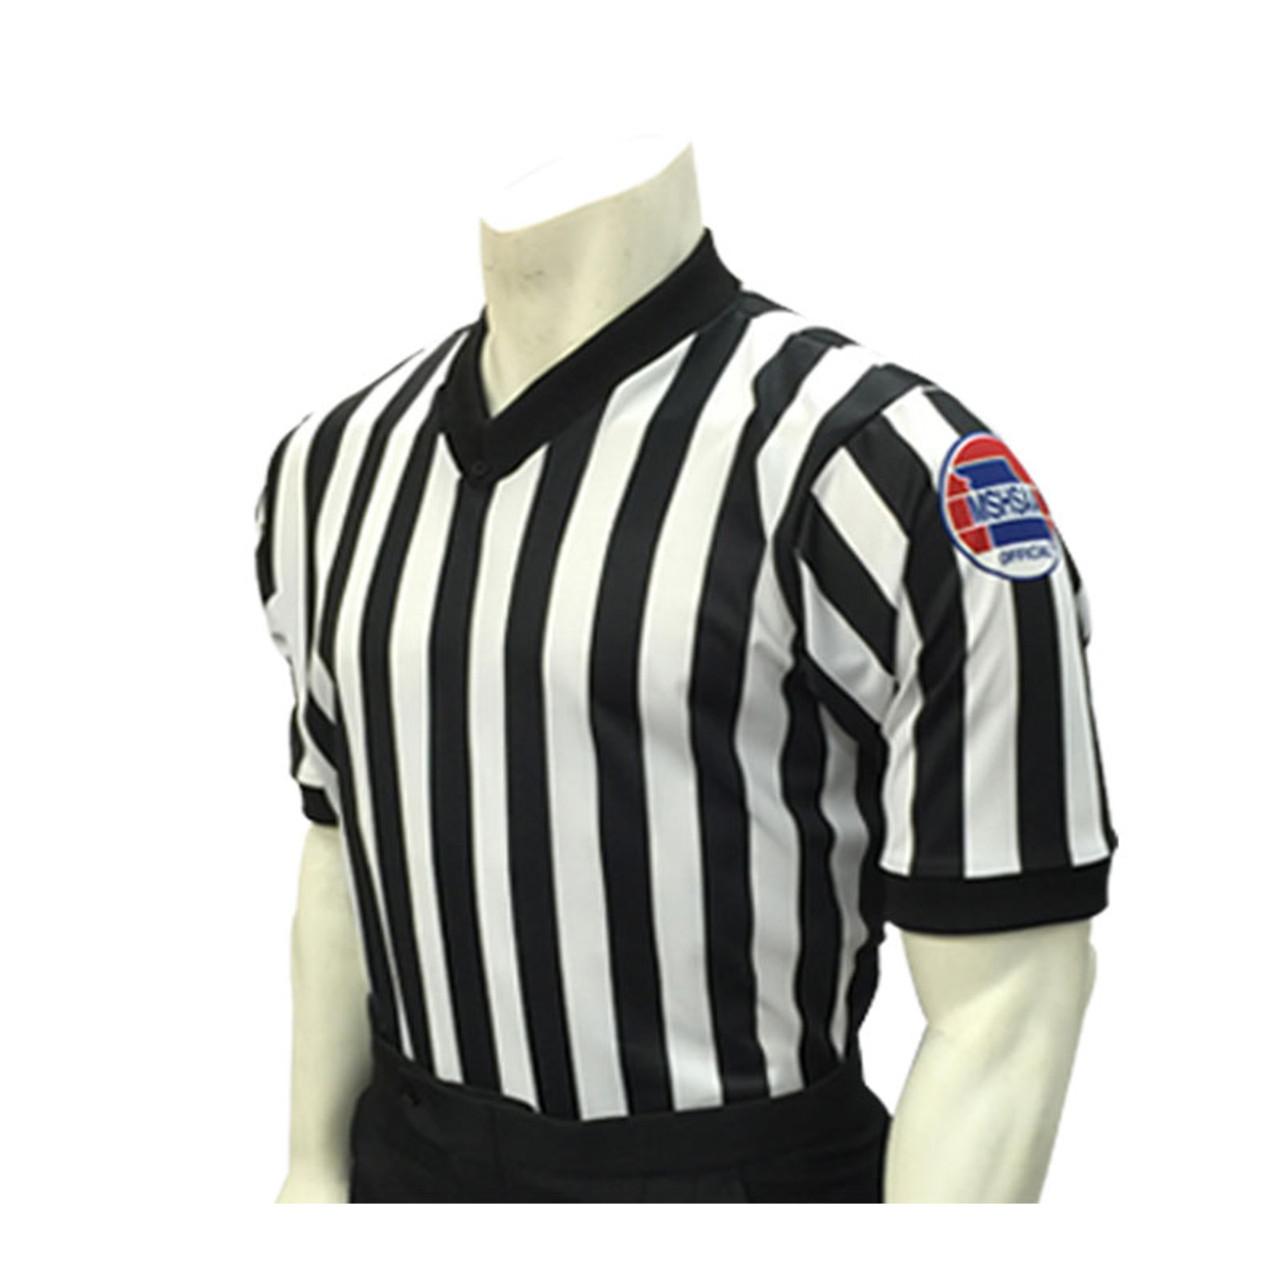 the best attitude 6b757 e6a96 Smitty Official's Apparel Missouri MSHSAA Men's Basketball Referee Shirt